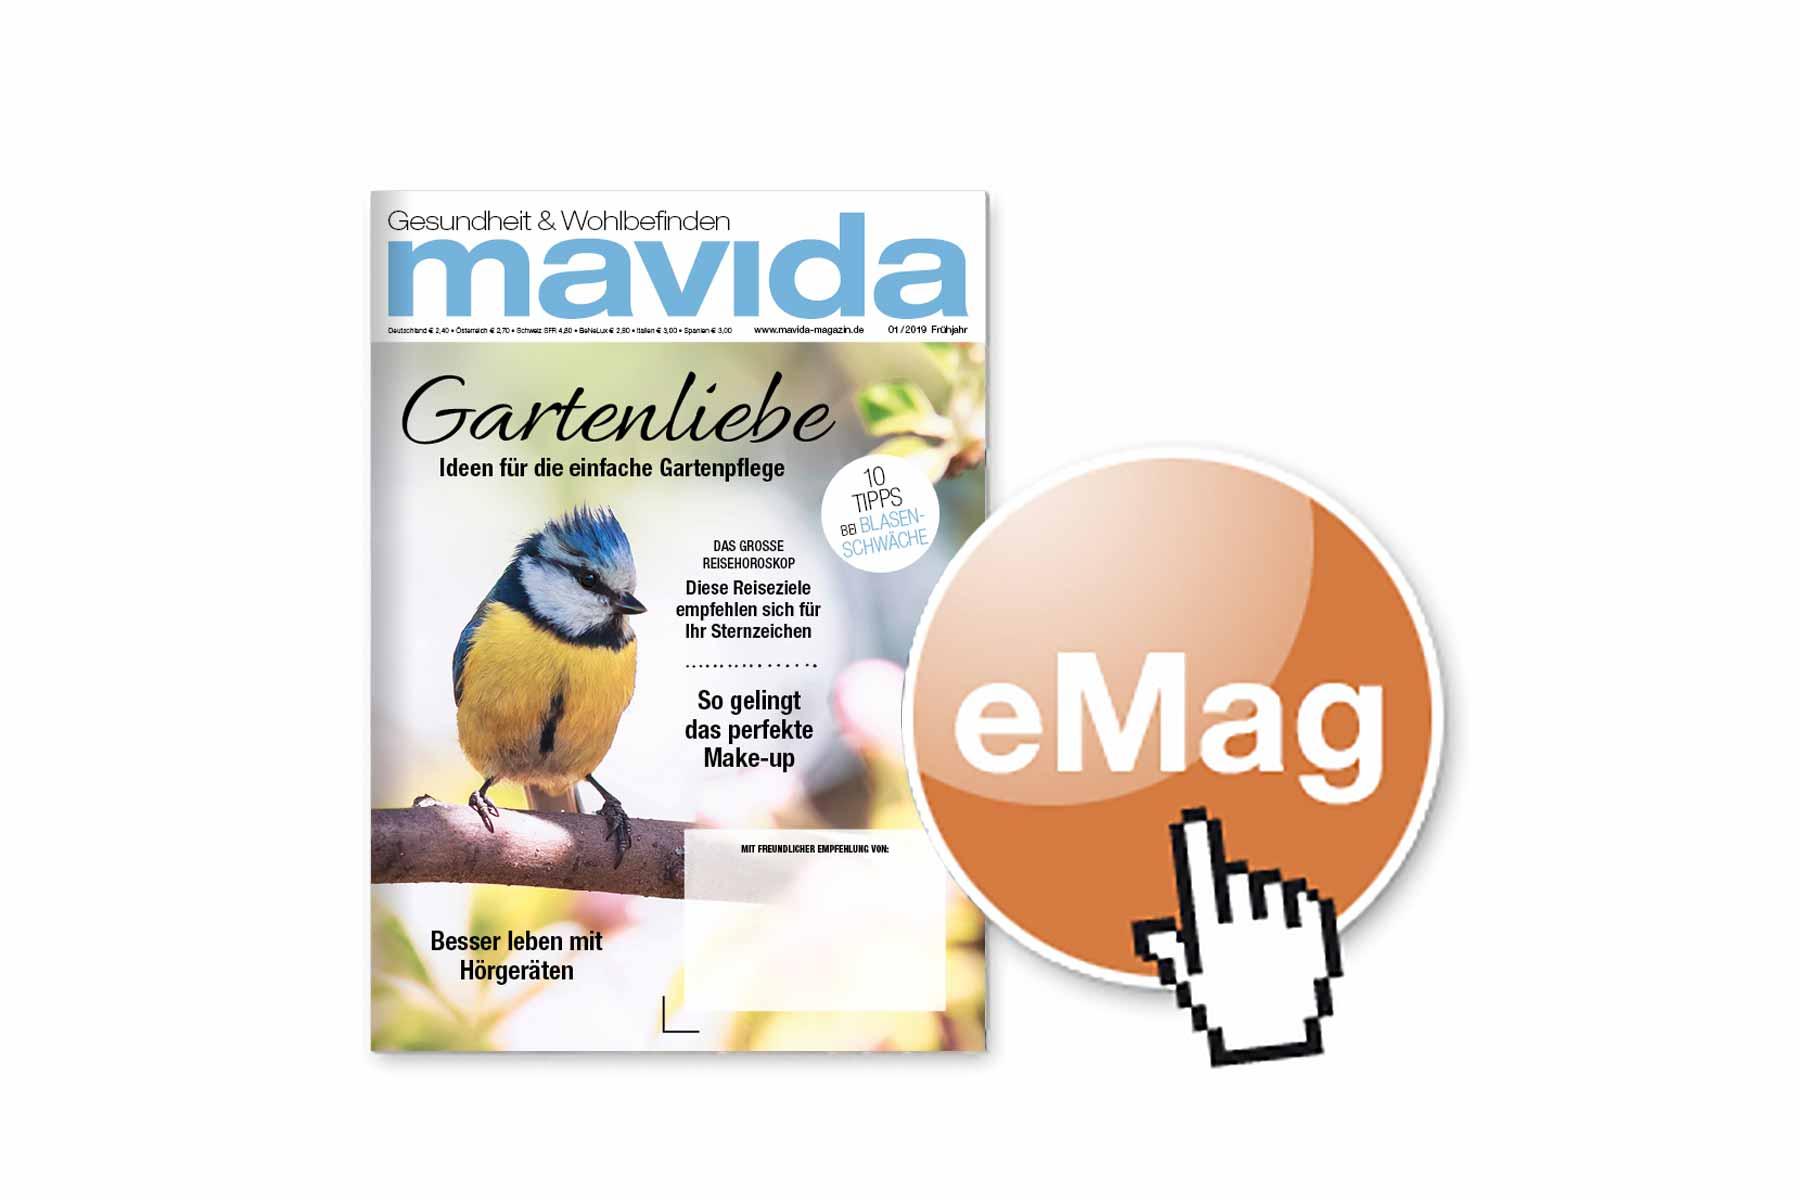 Mavida-eMag 01/2019